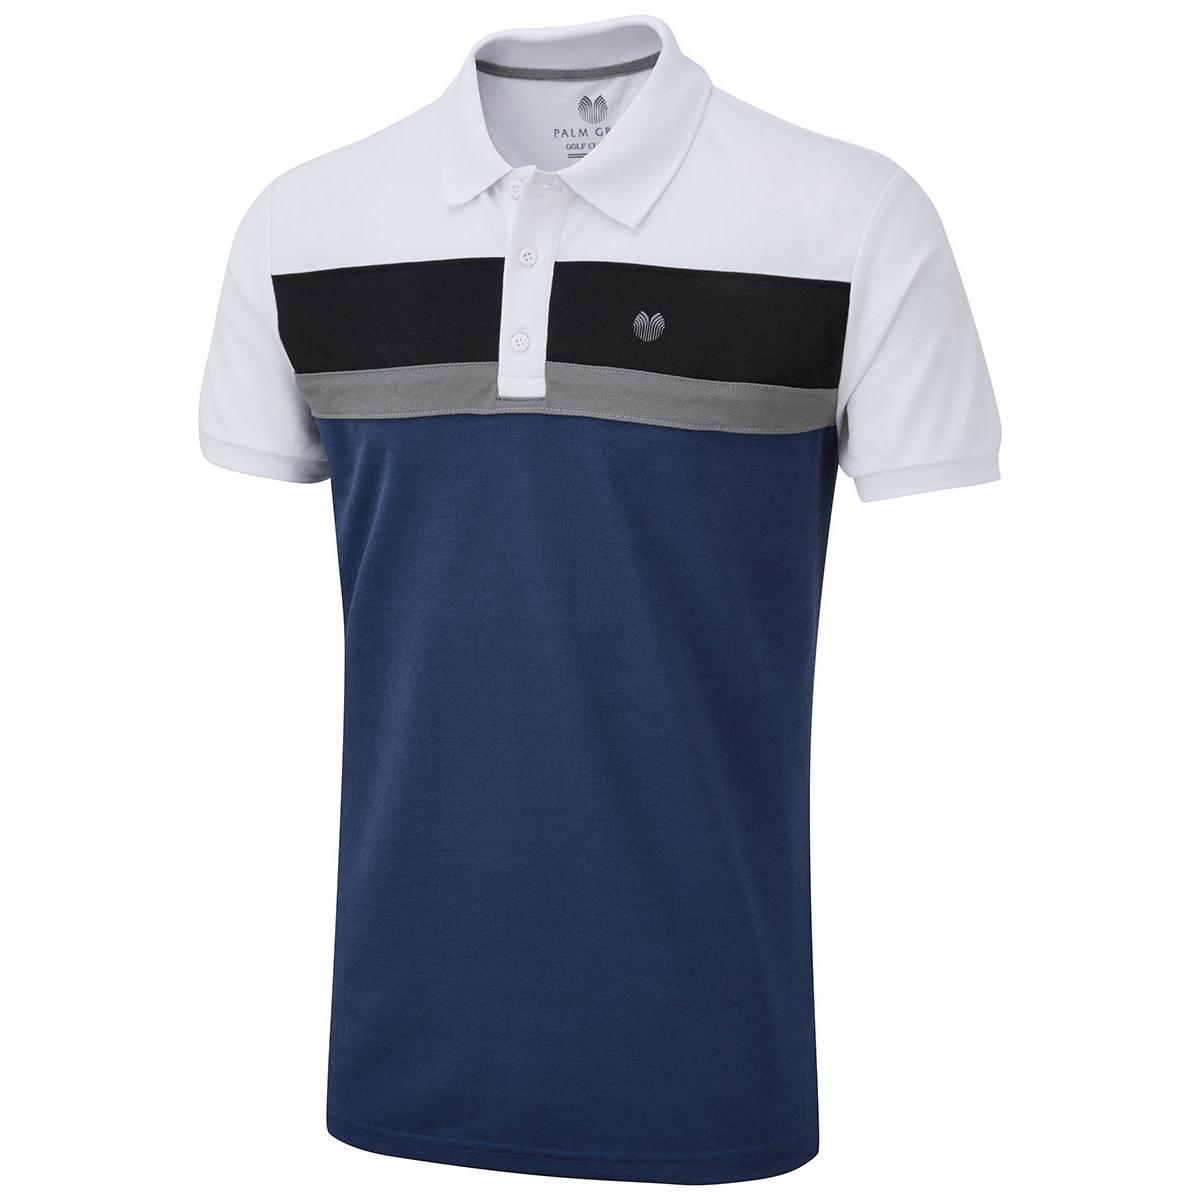 Palm Grove Colour Block Polo Shirt from american golf